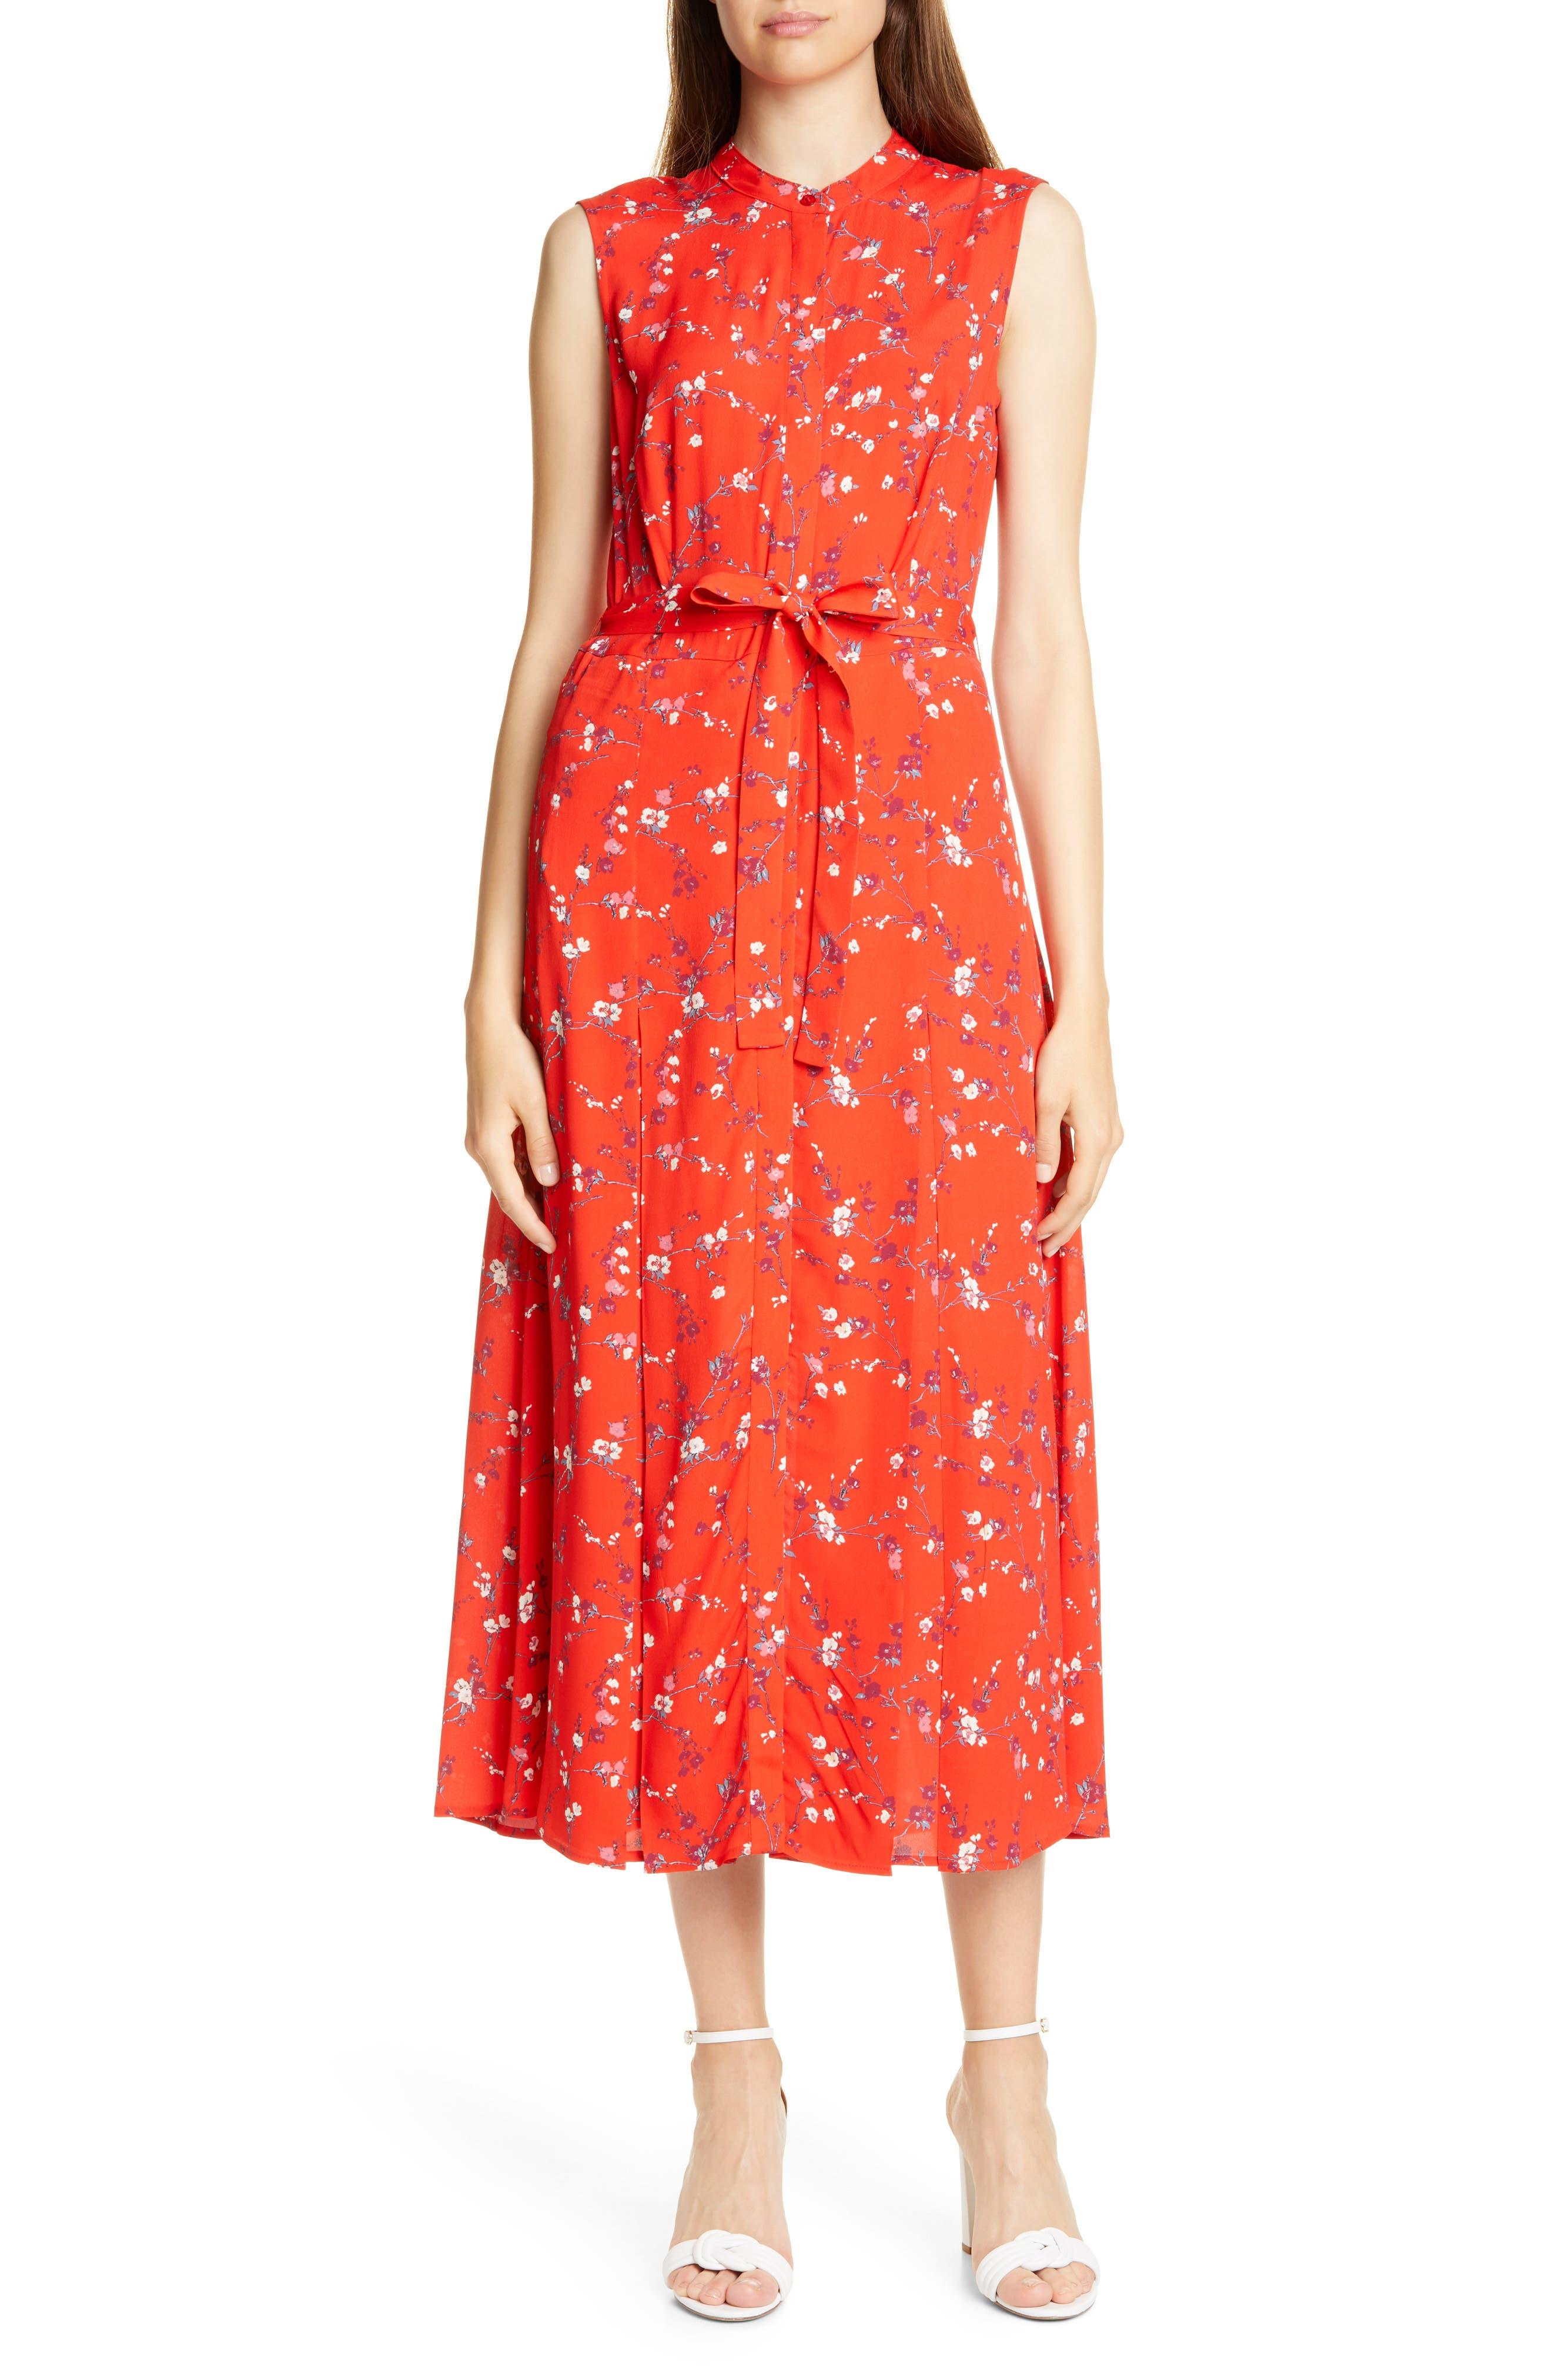 Judith & Charles Salerno Floral Midi Dress, Red